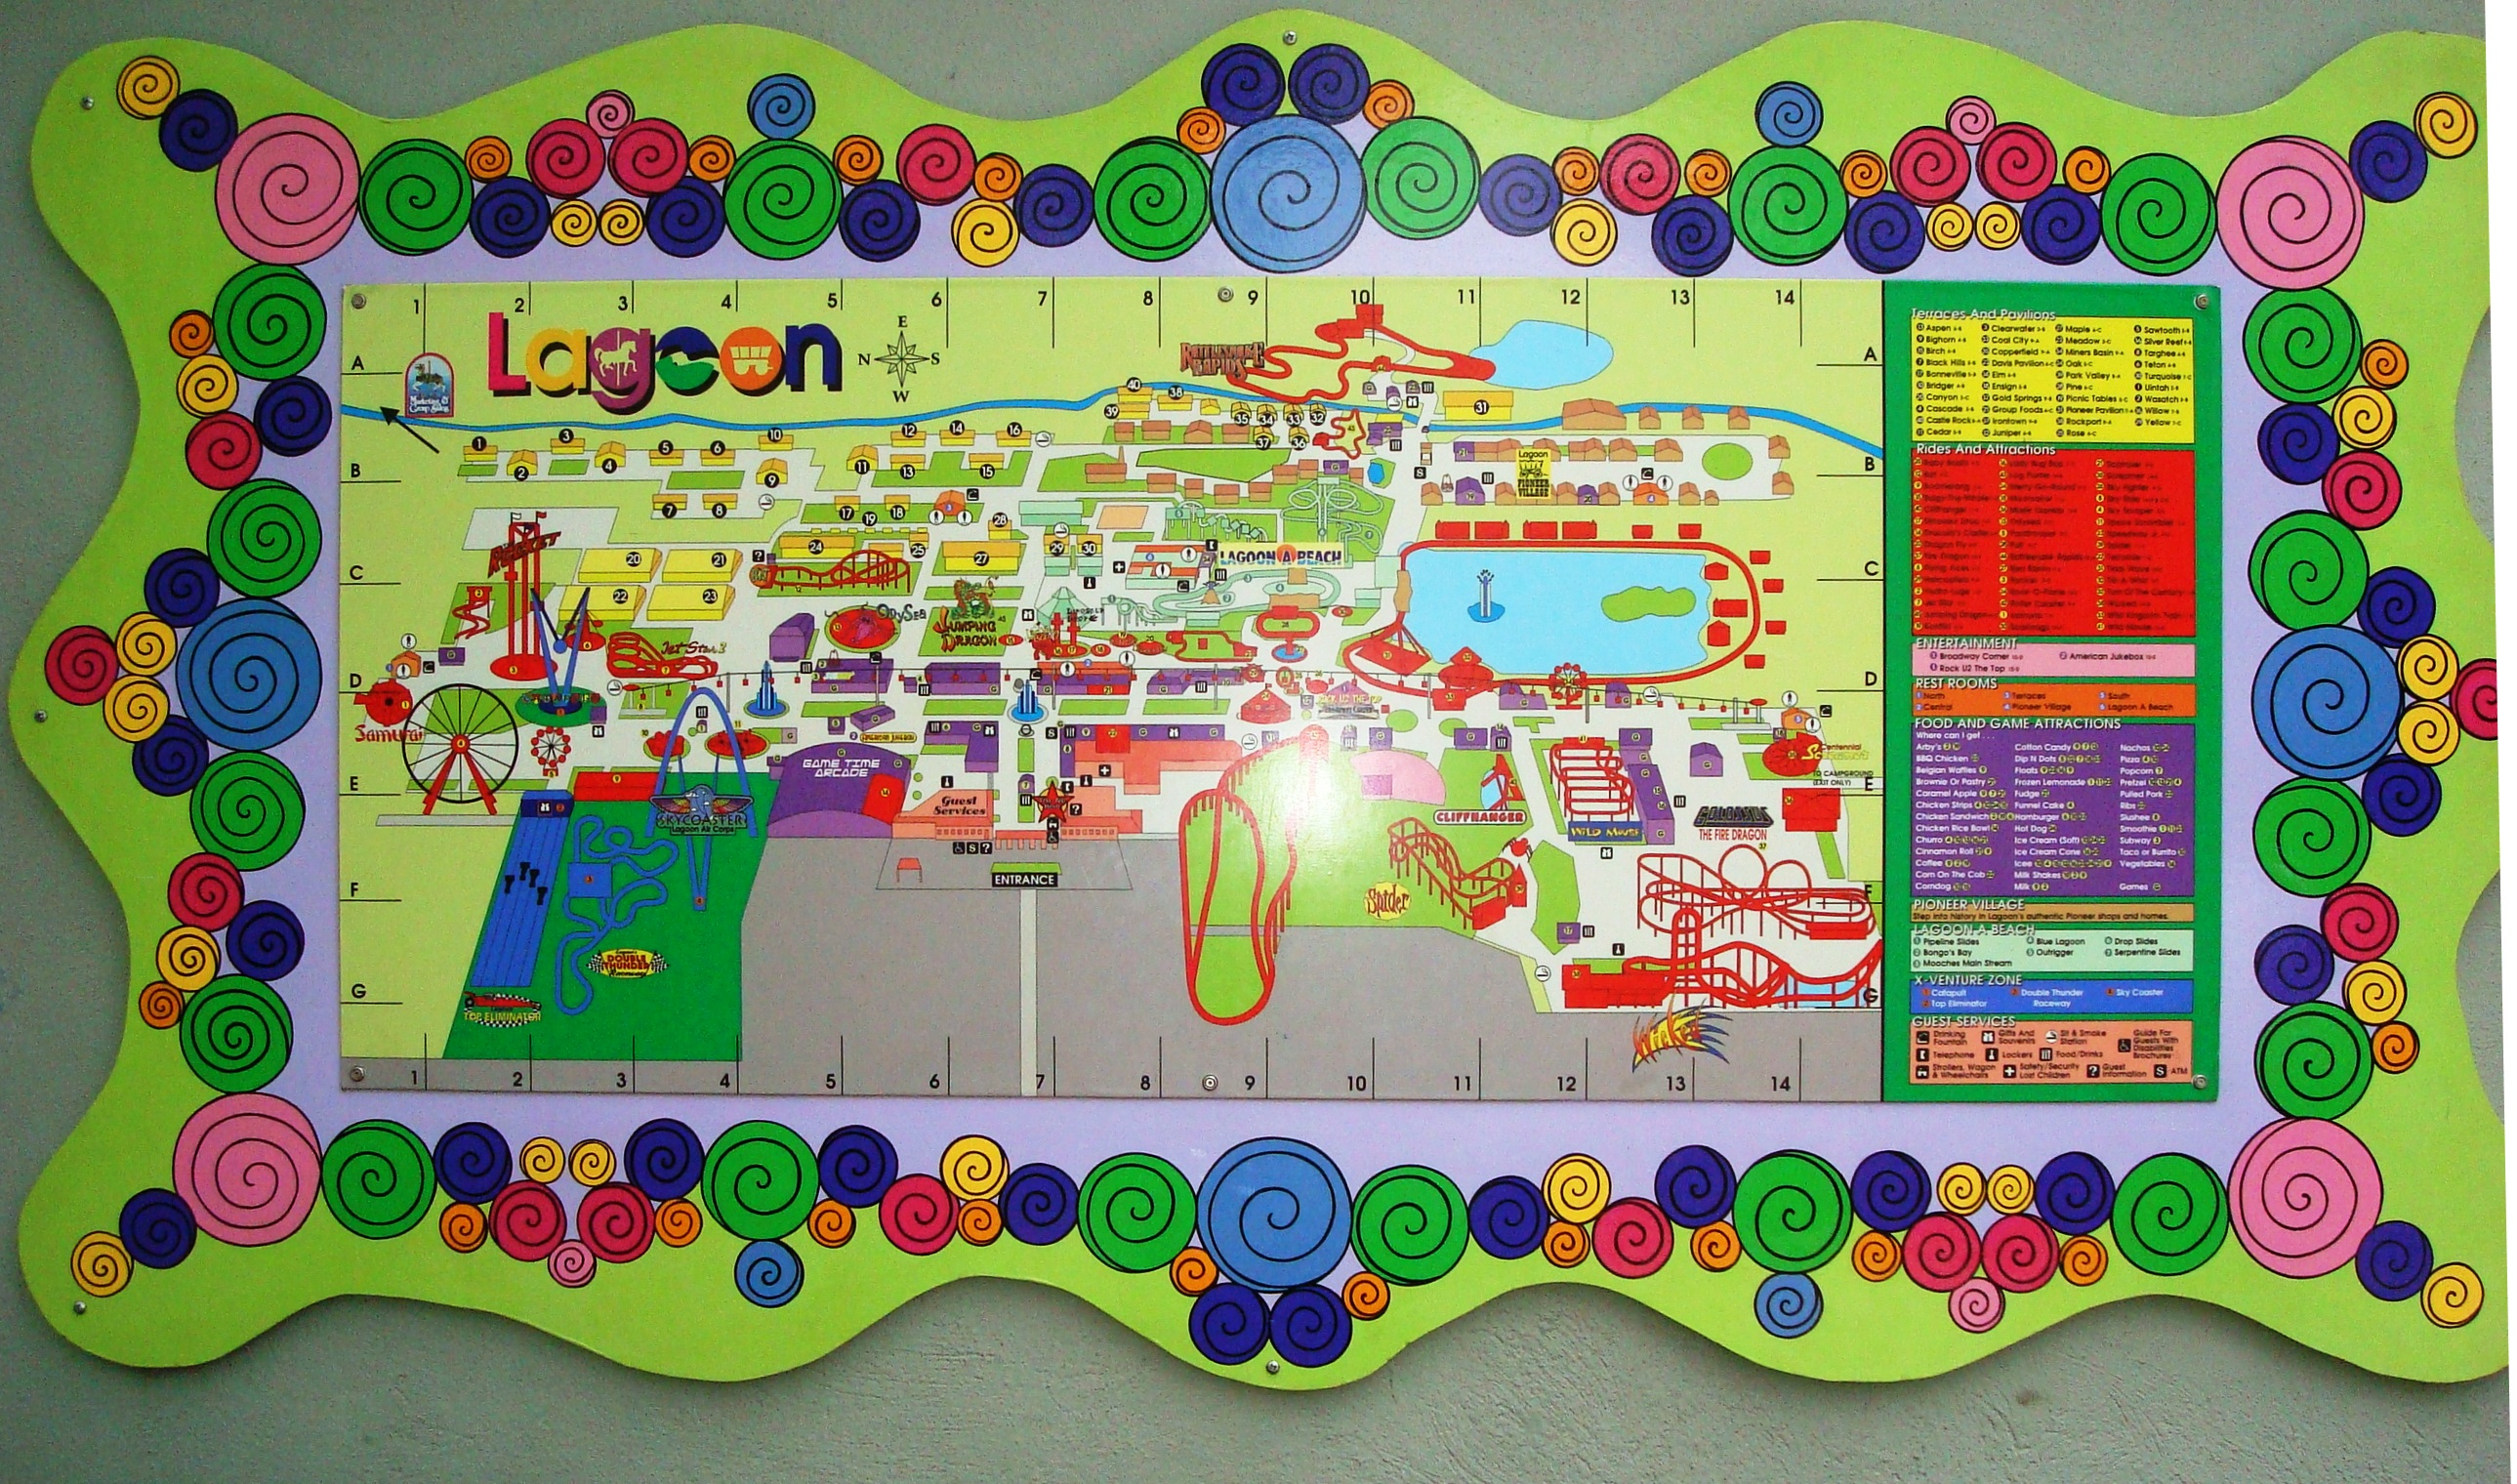 Lagoon Amusement Park Map  Wwwgalleryhip  The